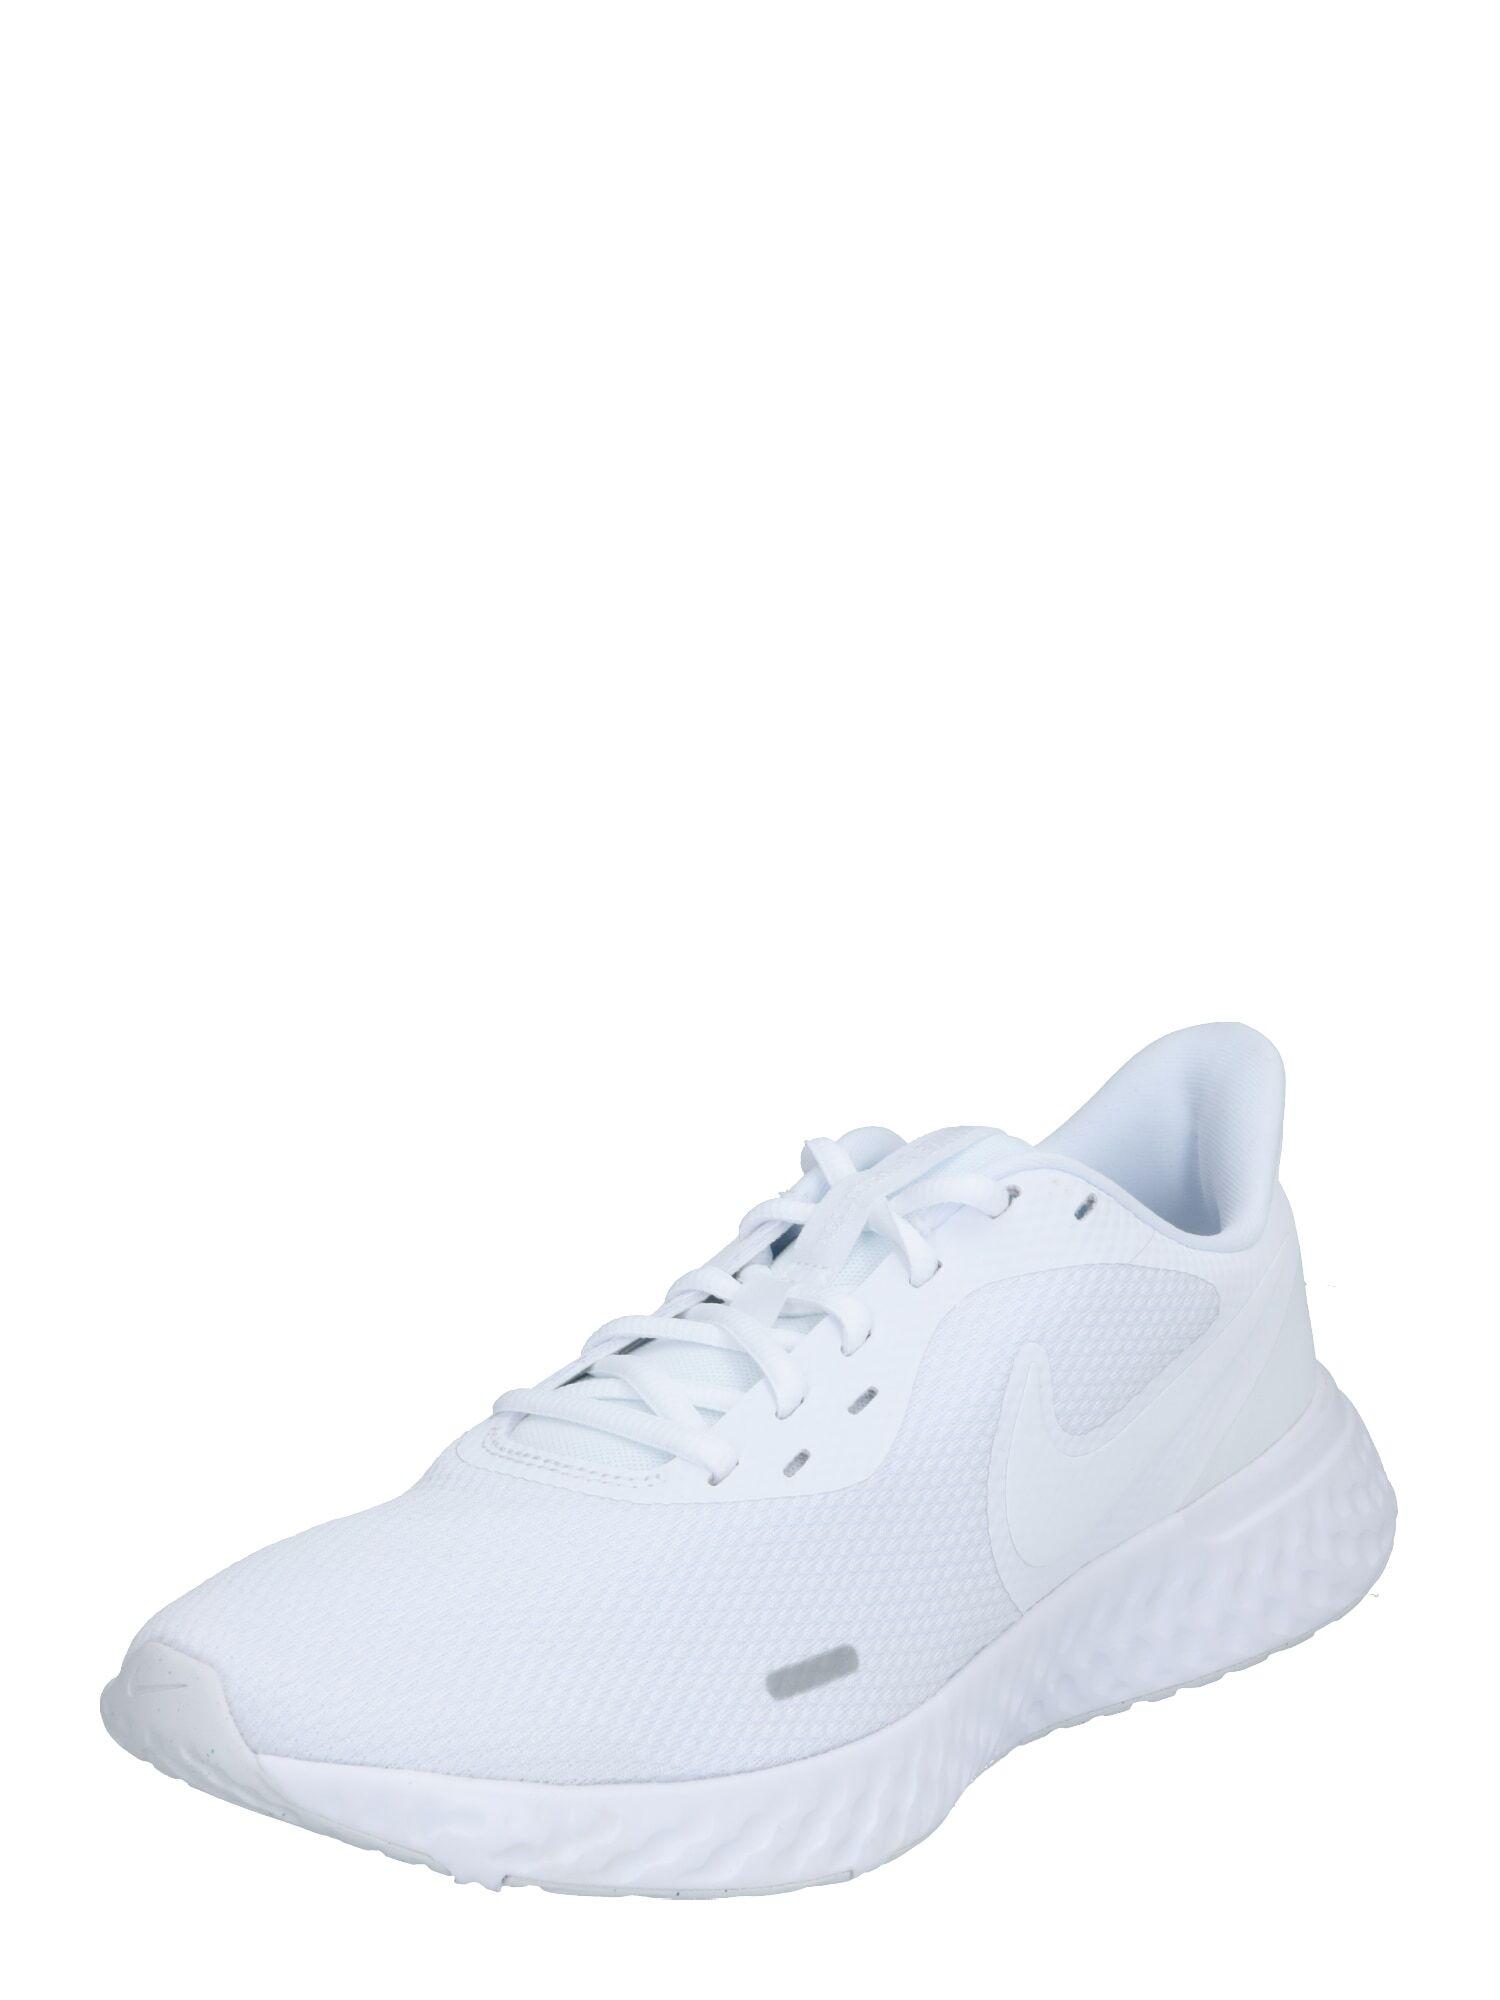 NIKE Chaussure de course 'Revolution 5'  - Blanc - Taille: 10.5 - male